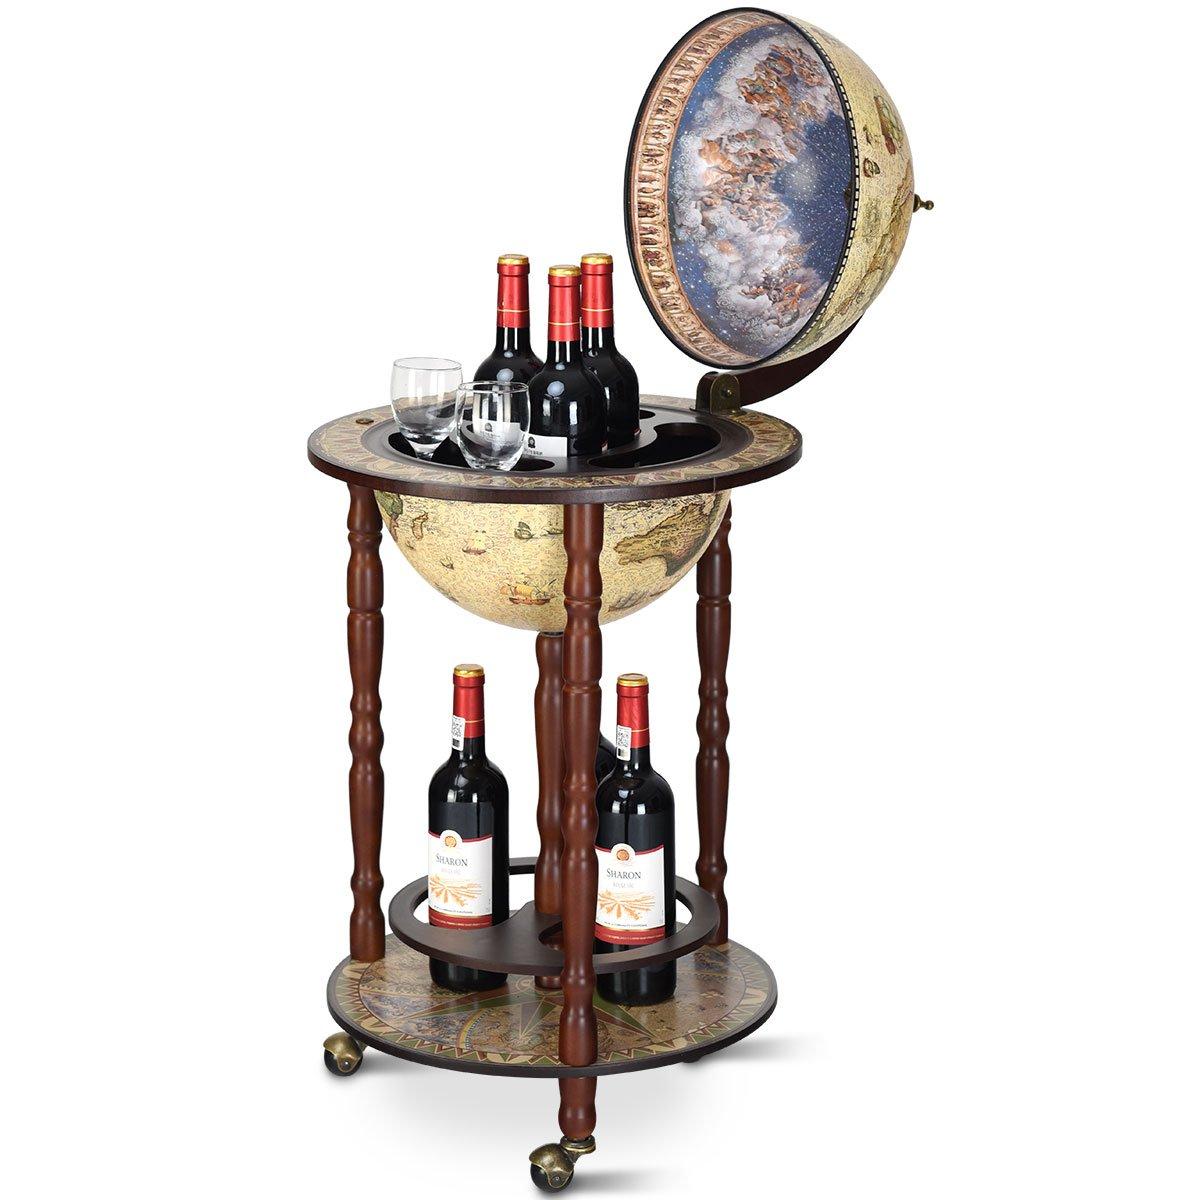 Goplus 17″ Wood Globe Wine Bar Stand 16th Century Italian Rack Liquor Bottle Shelf with Wheels (Creamy White)